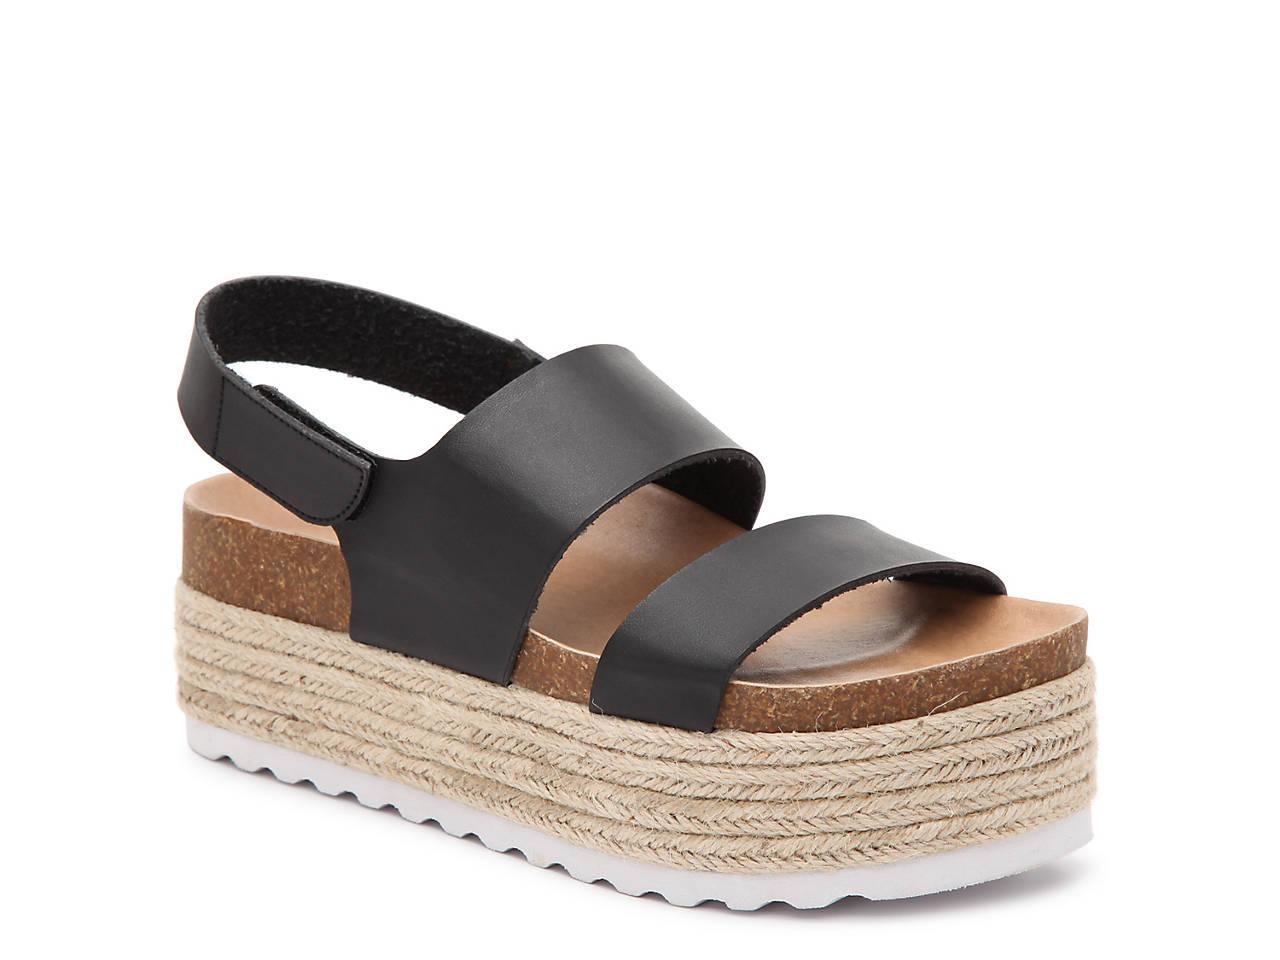 823147f95 Dirty Laundry Ponoma Espadrille Platform Sandal Women's Shoes | DSW